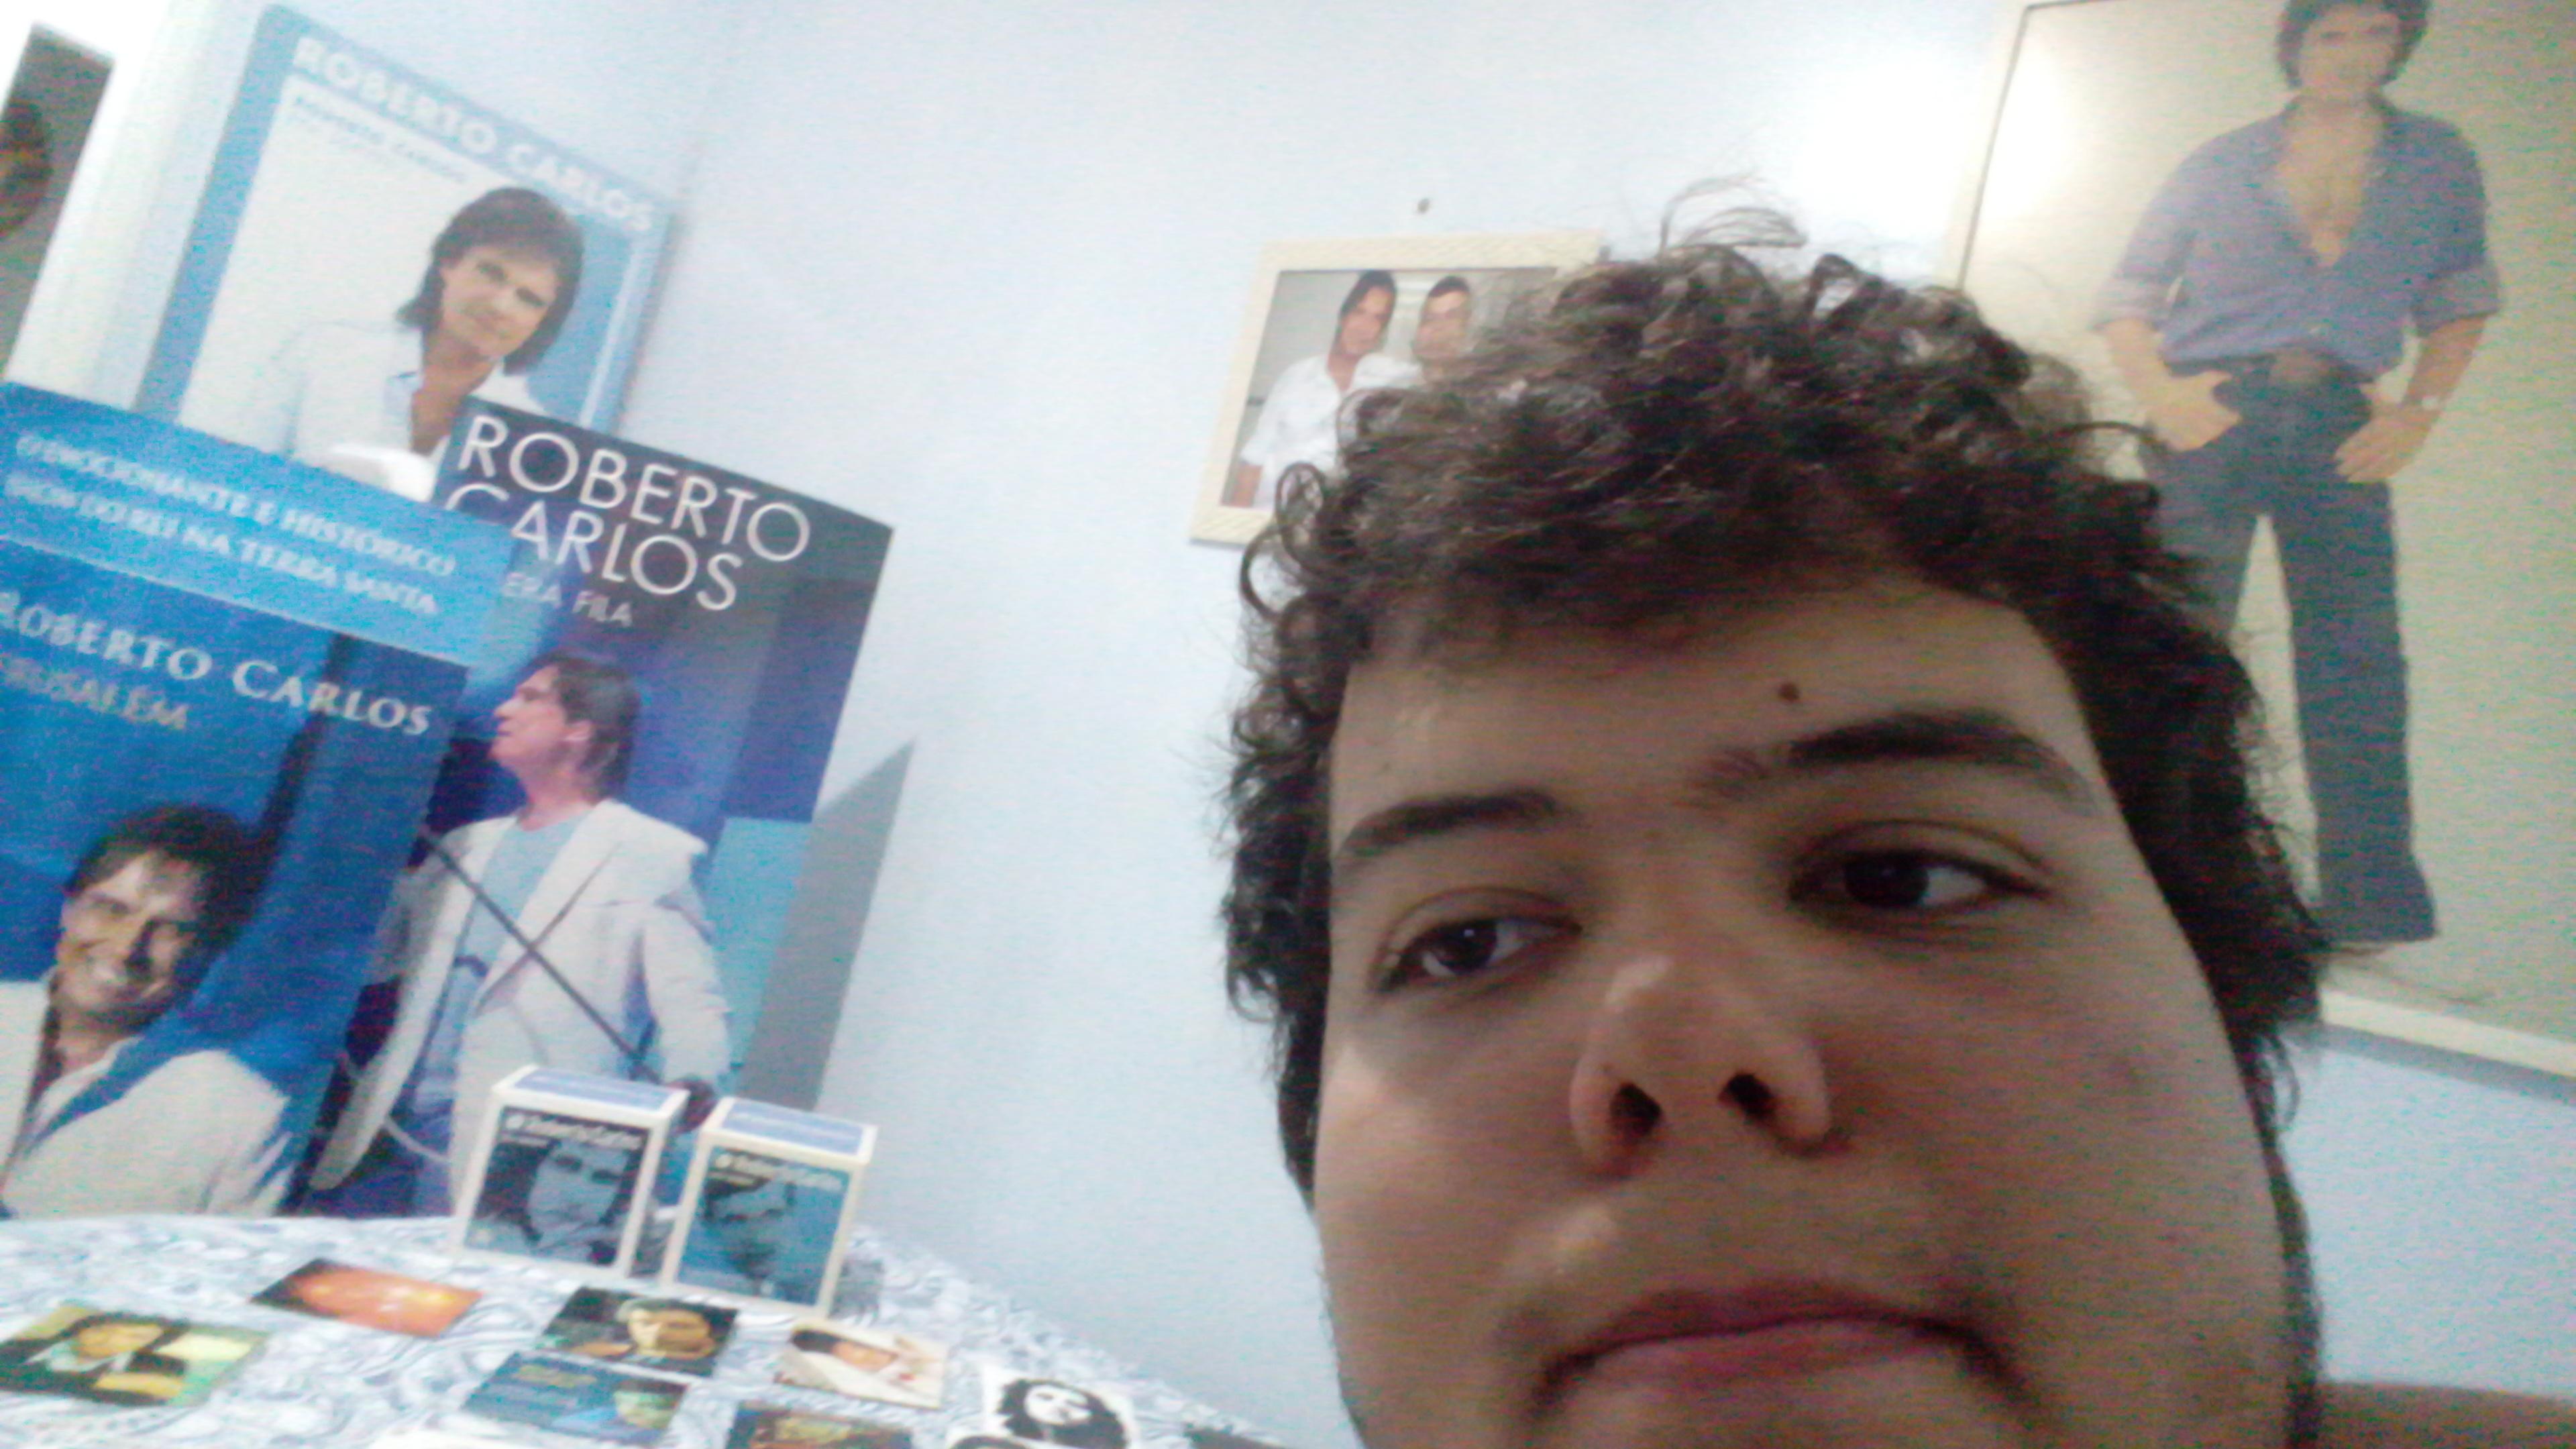 Nicholas Amaral Alves – Durmo e acordo vendo nosso rei Roberto Carlos - Durmo e acordo vendo nosso rei Roberto carlos